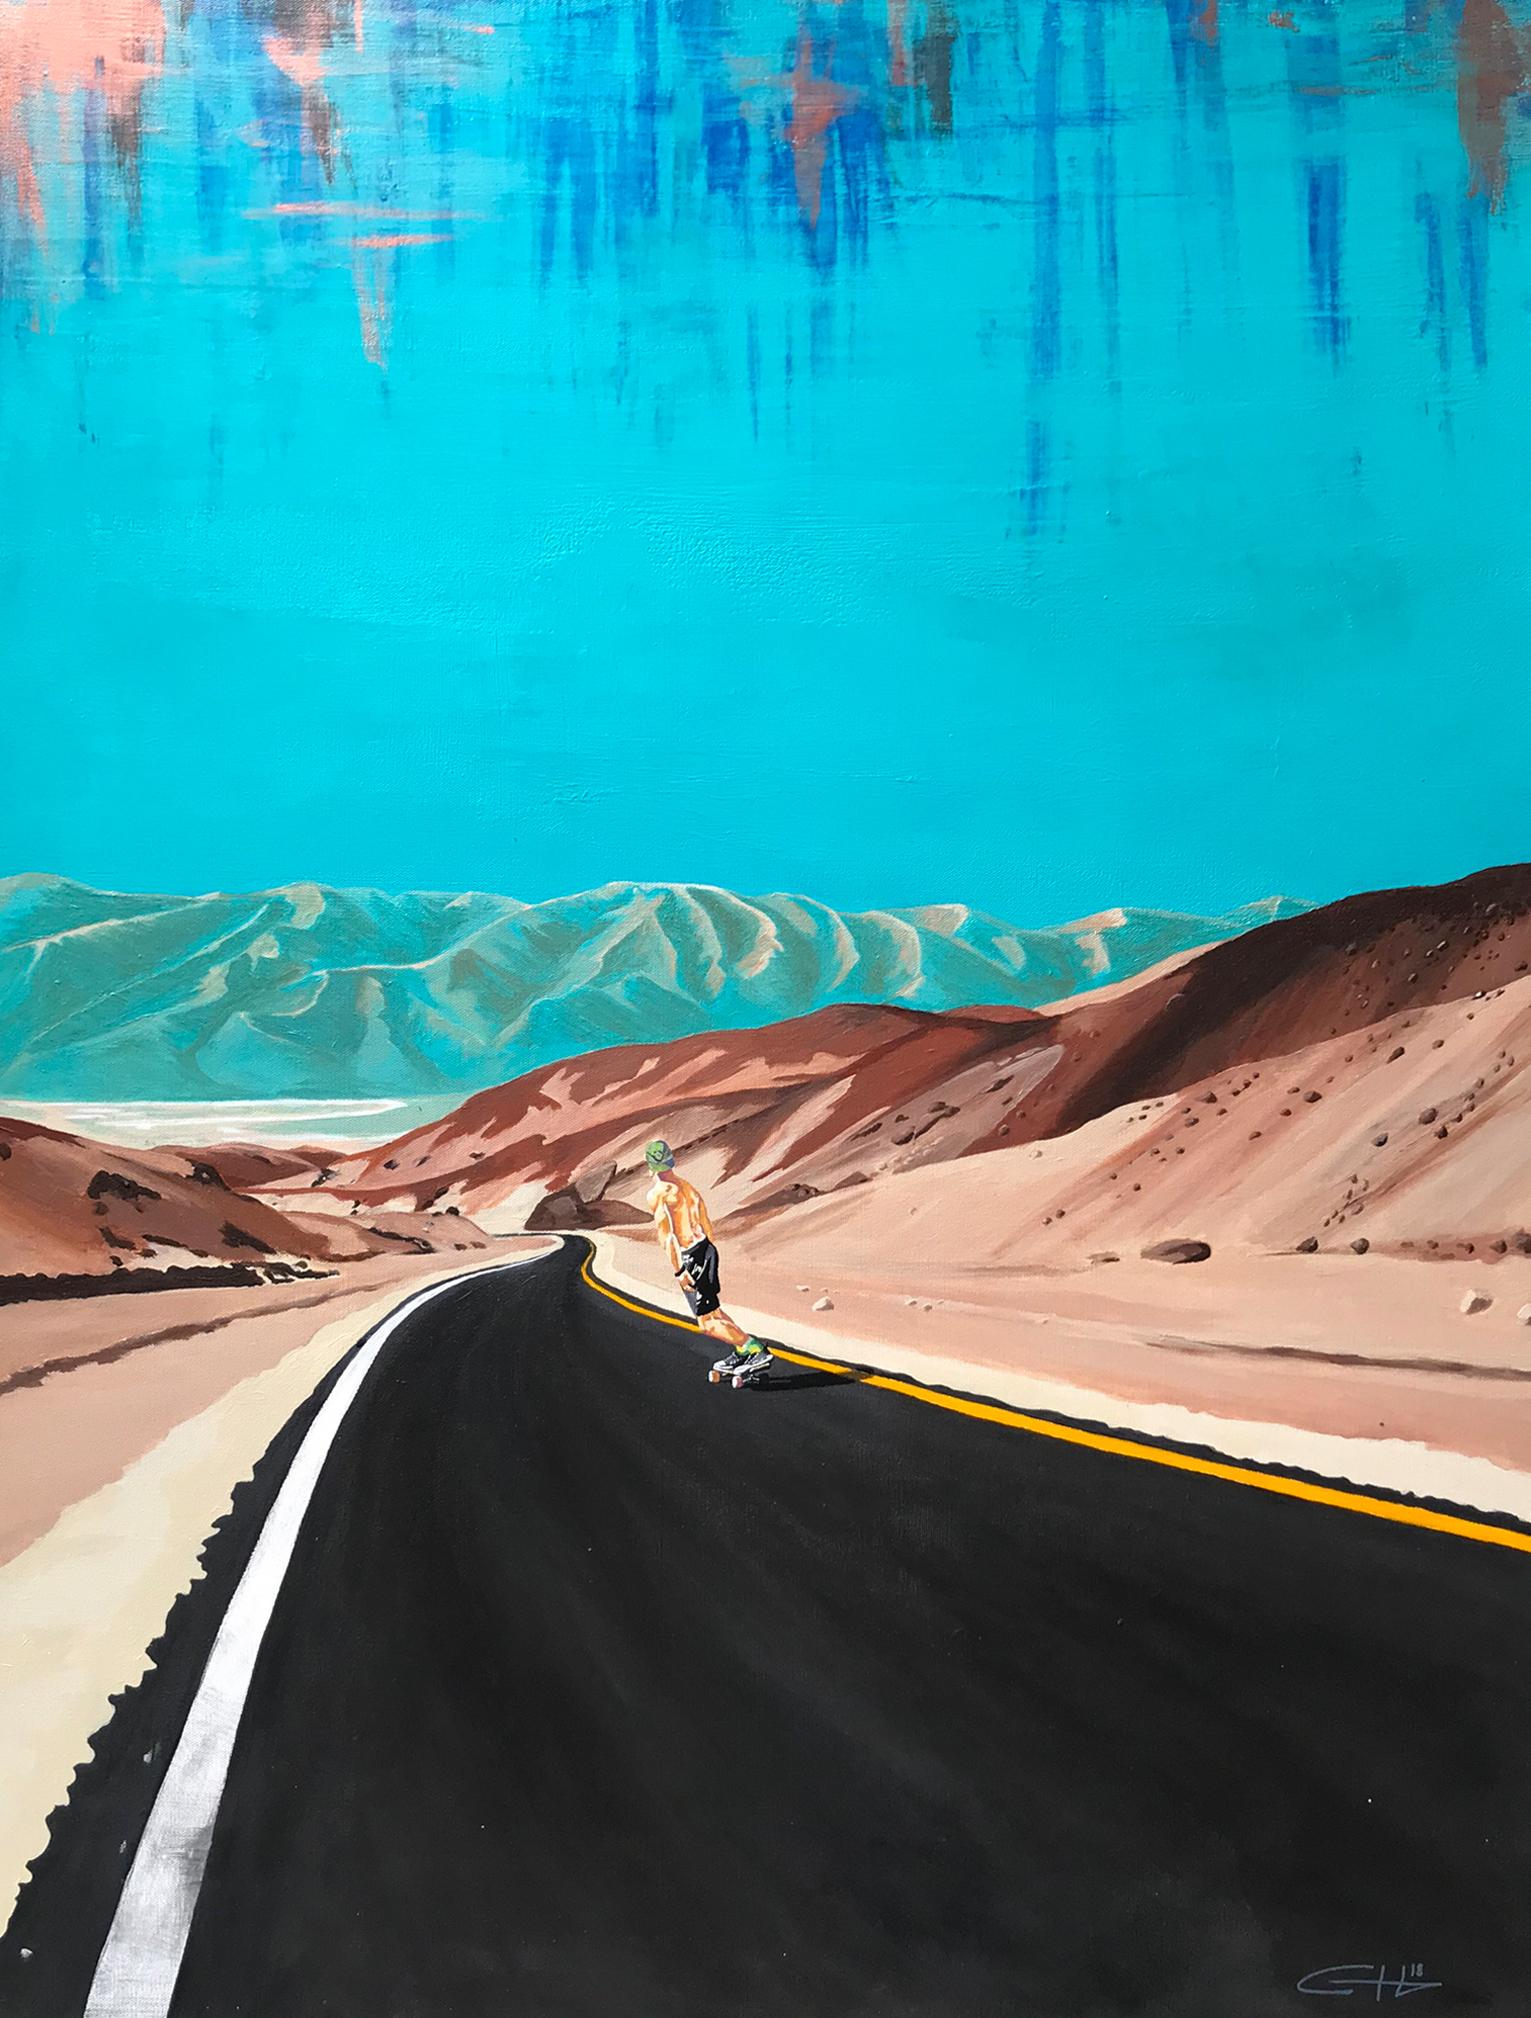 Original Death Valley Skateboarder Painting